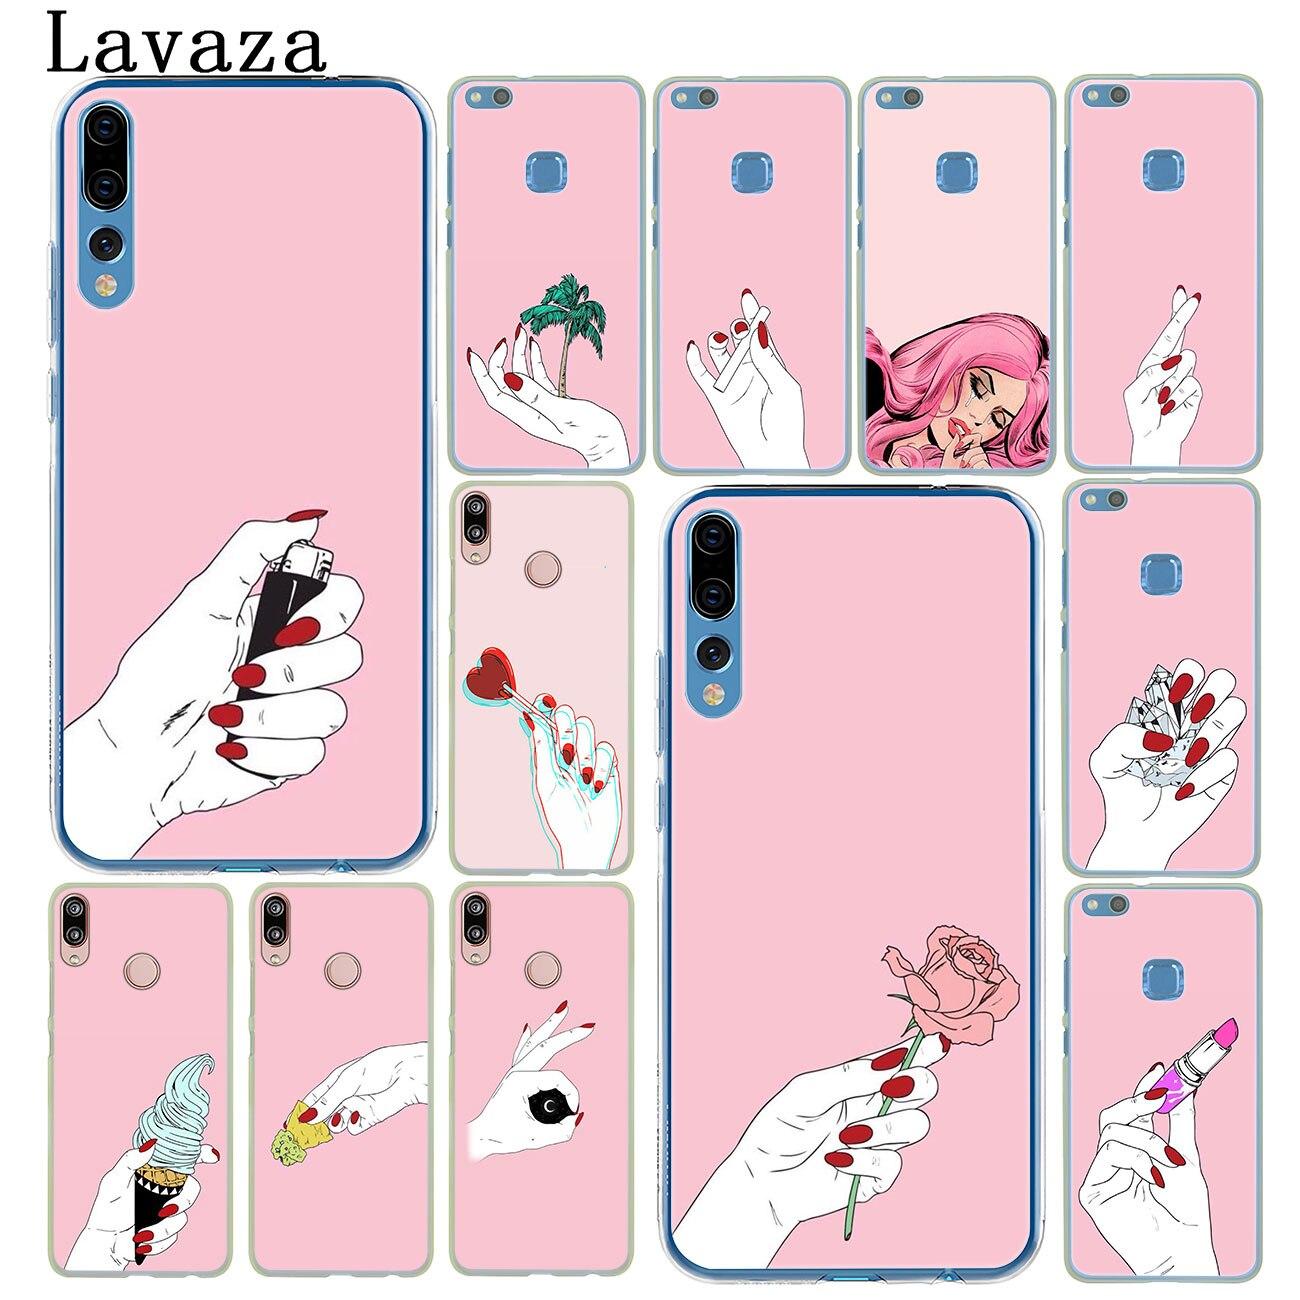 Lavaza woman girl hand wallpaper Phone Case for Huawei P30 P20 P9 P10 Plus P8 Mate 20 Pro Lite Mini 2016 2017 P smart 2019 Cover huawei p30 pro обои